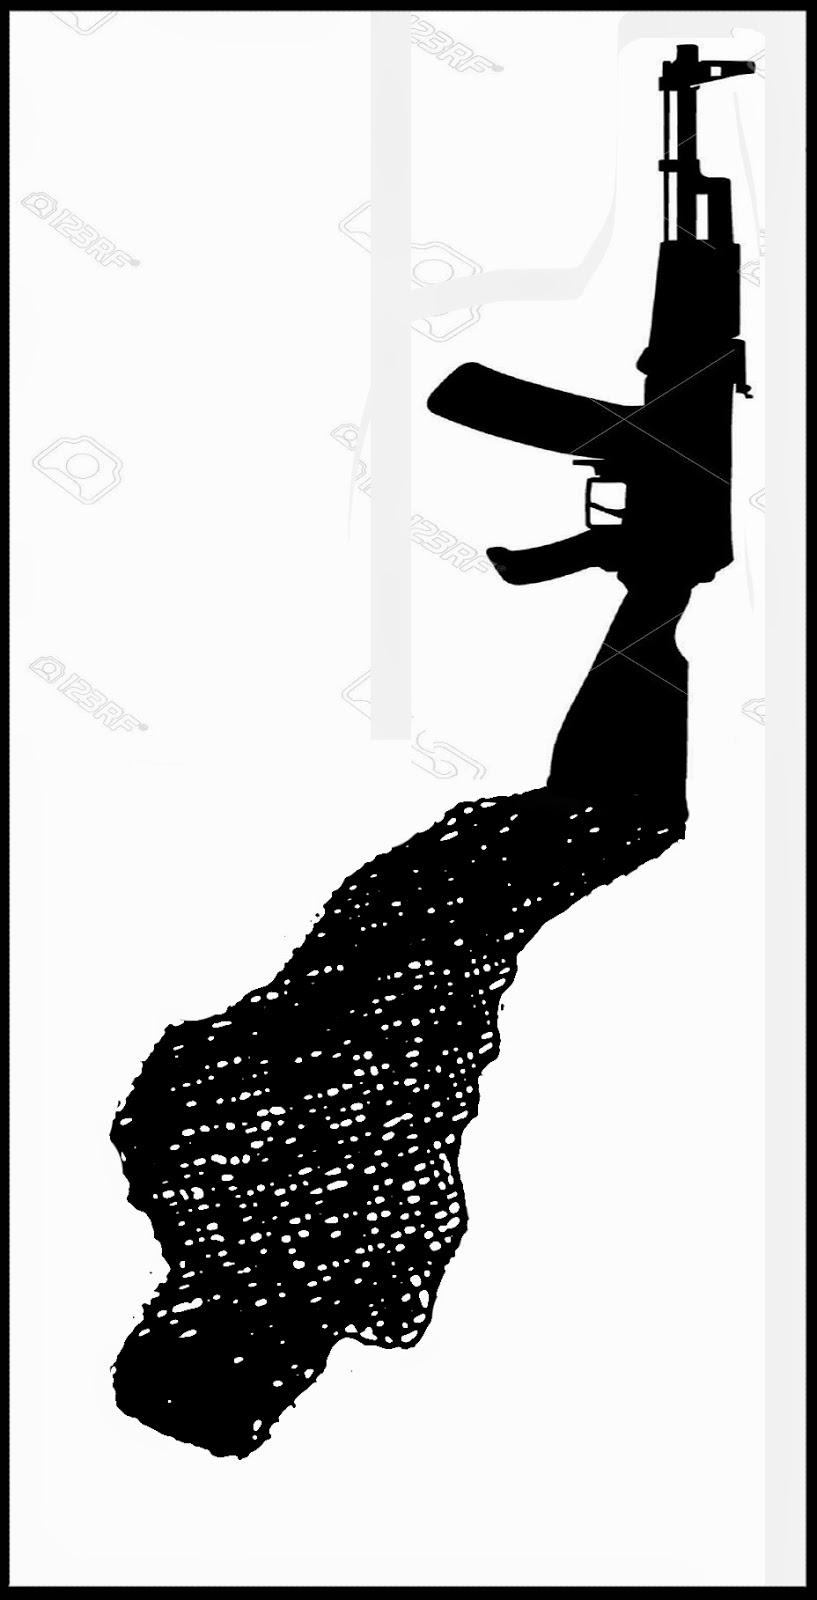 817x1600 Drawing Rip Cabu, Charb, Tignous And Wolinski